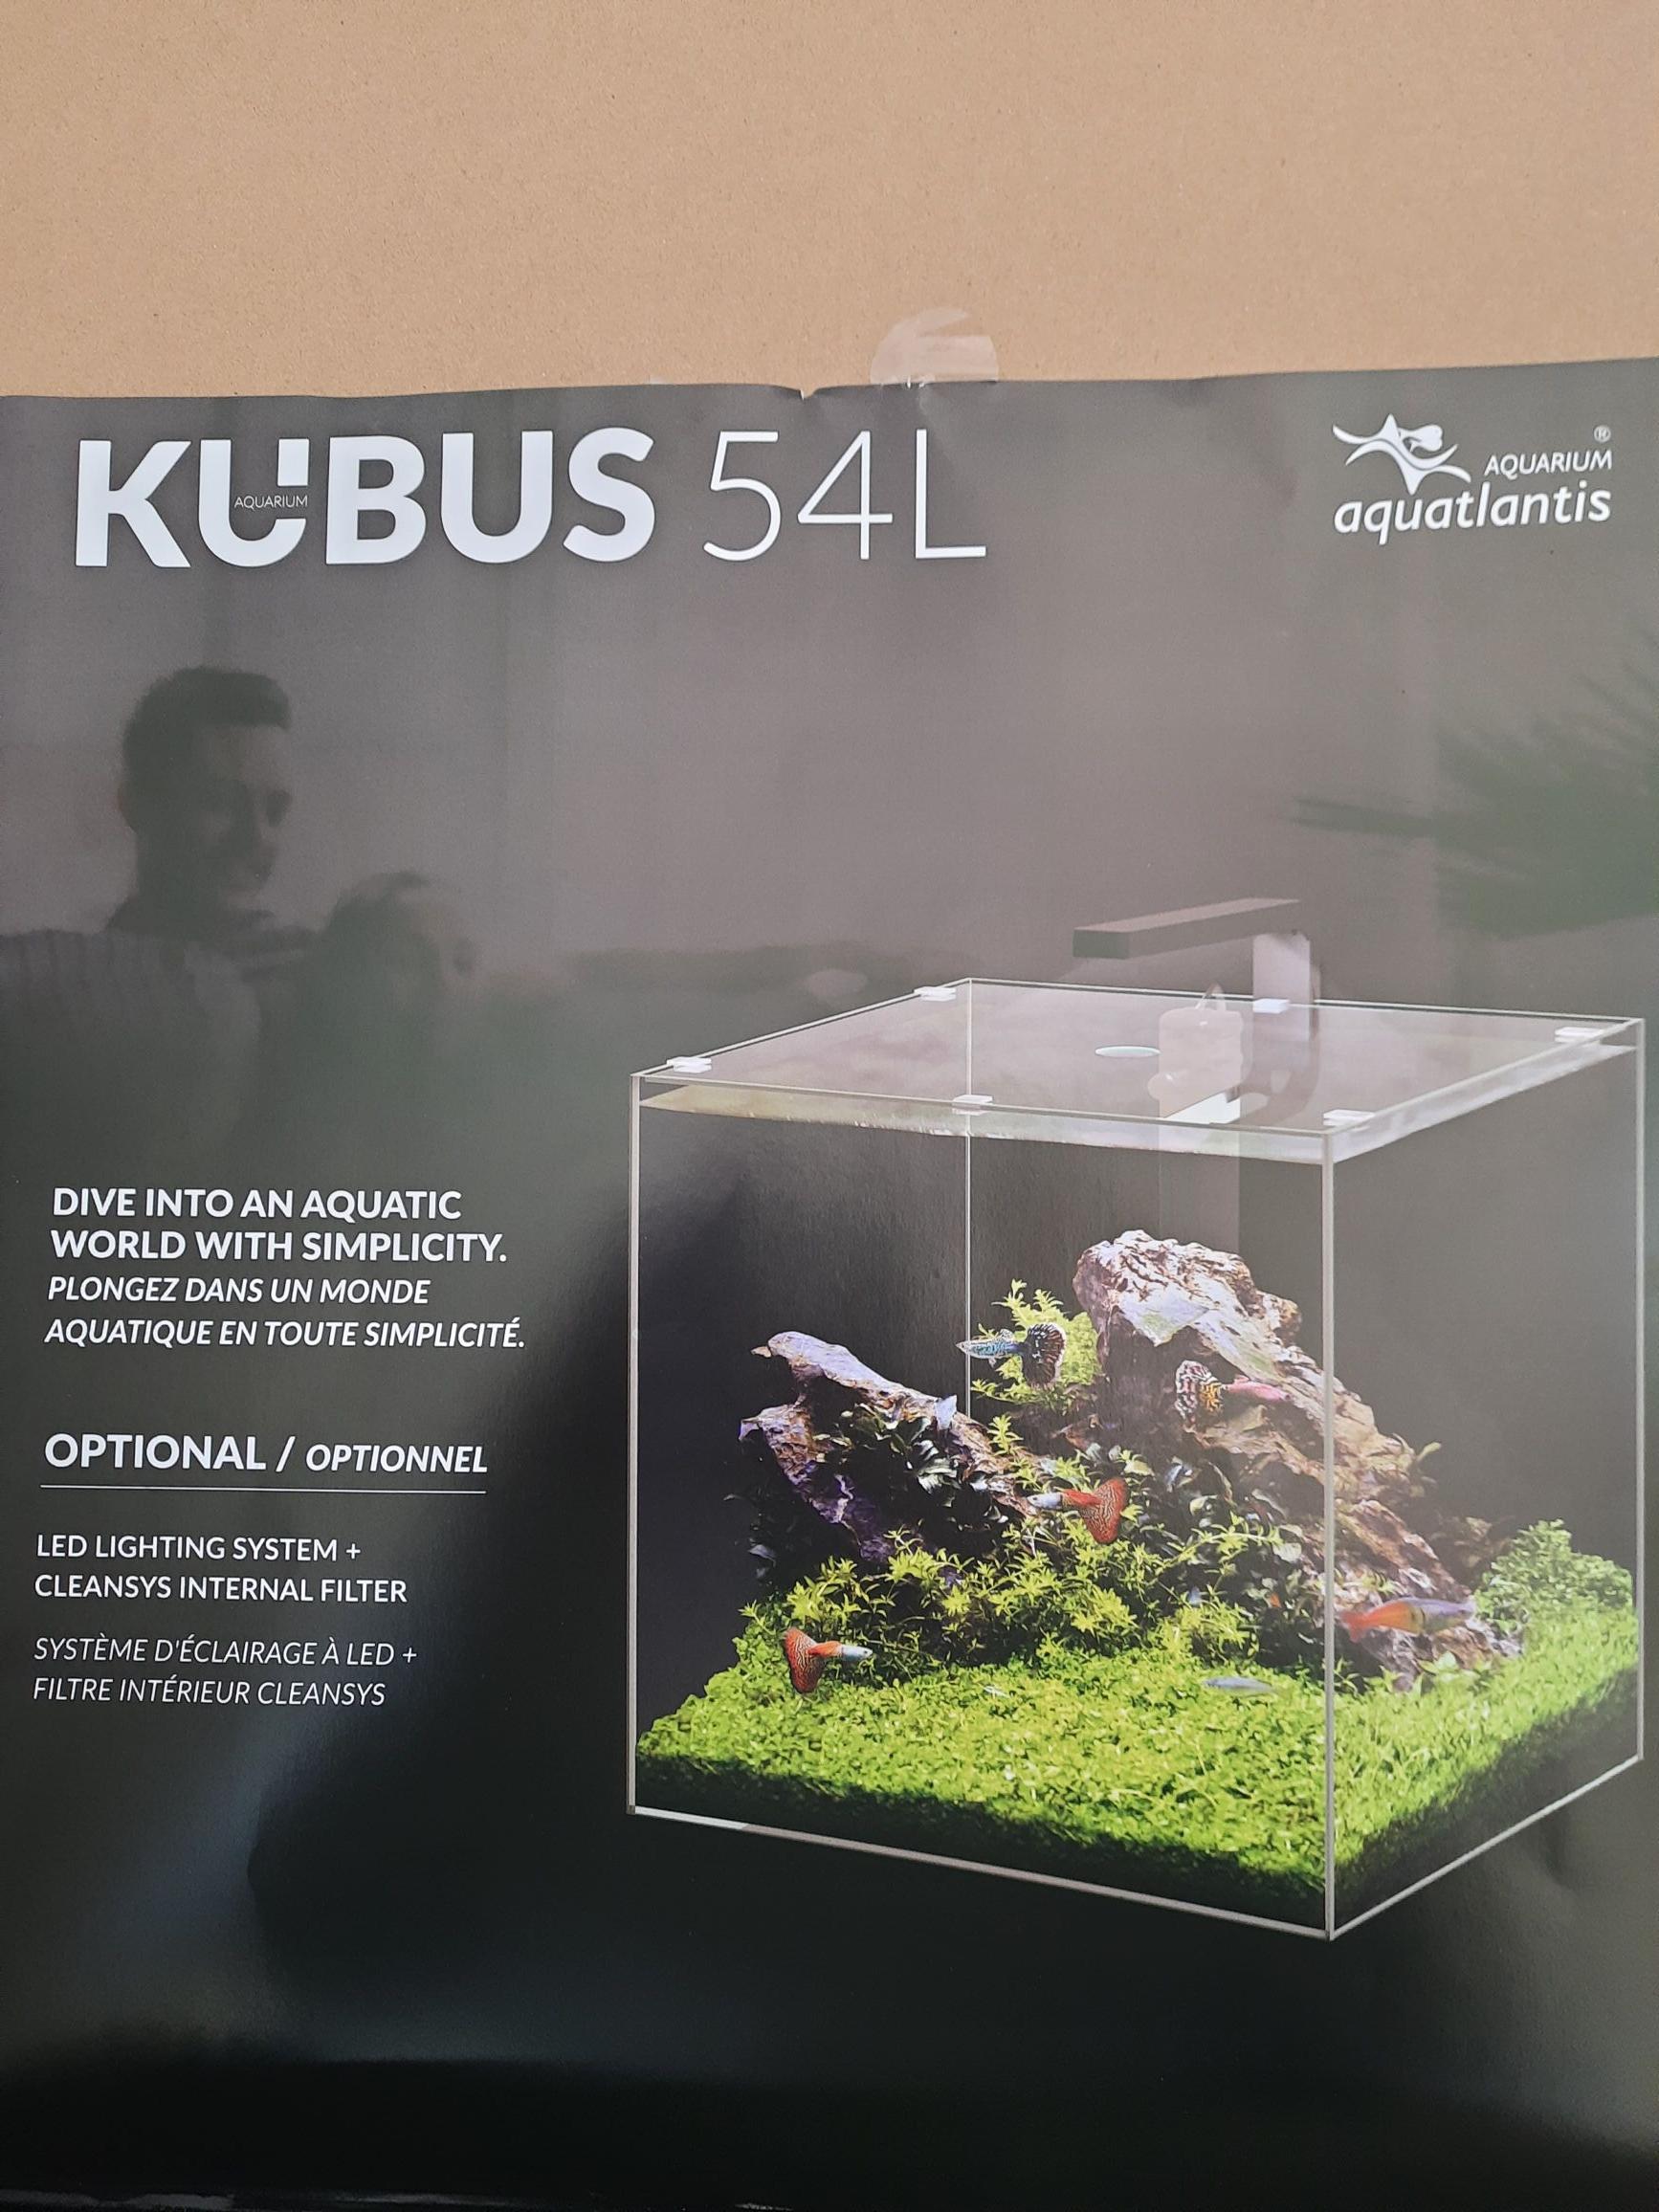 Aquarium Cubique 54L Aquatlantis Kubus